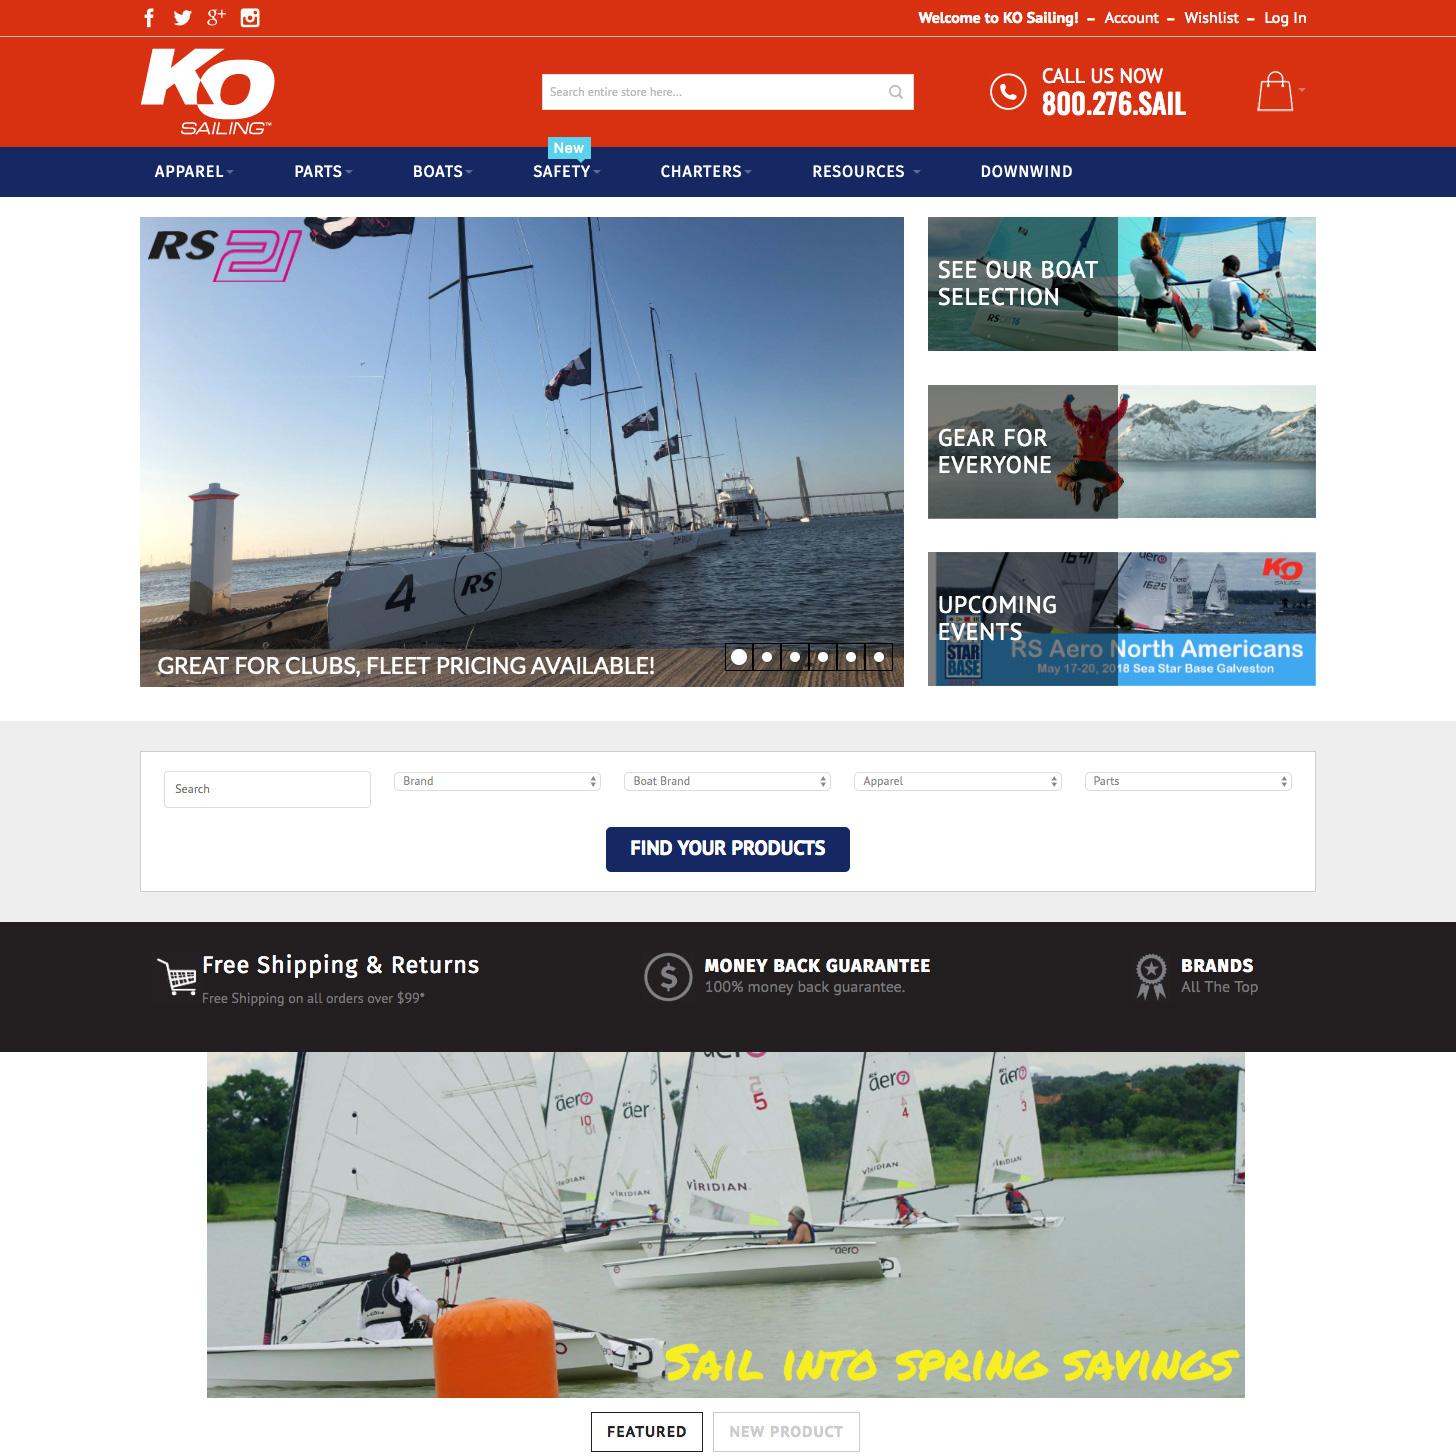 KO Sailing